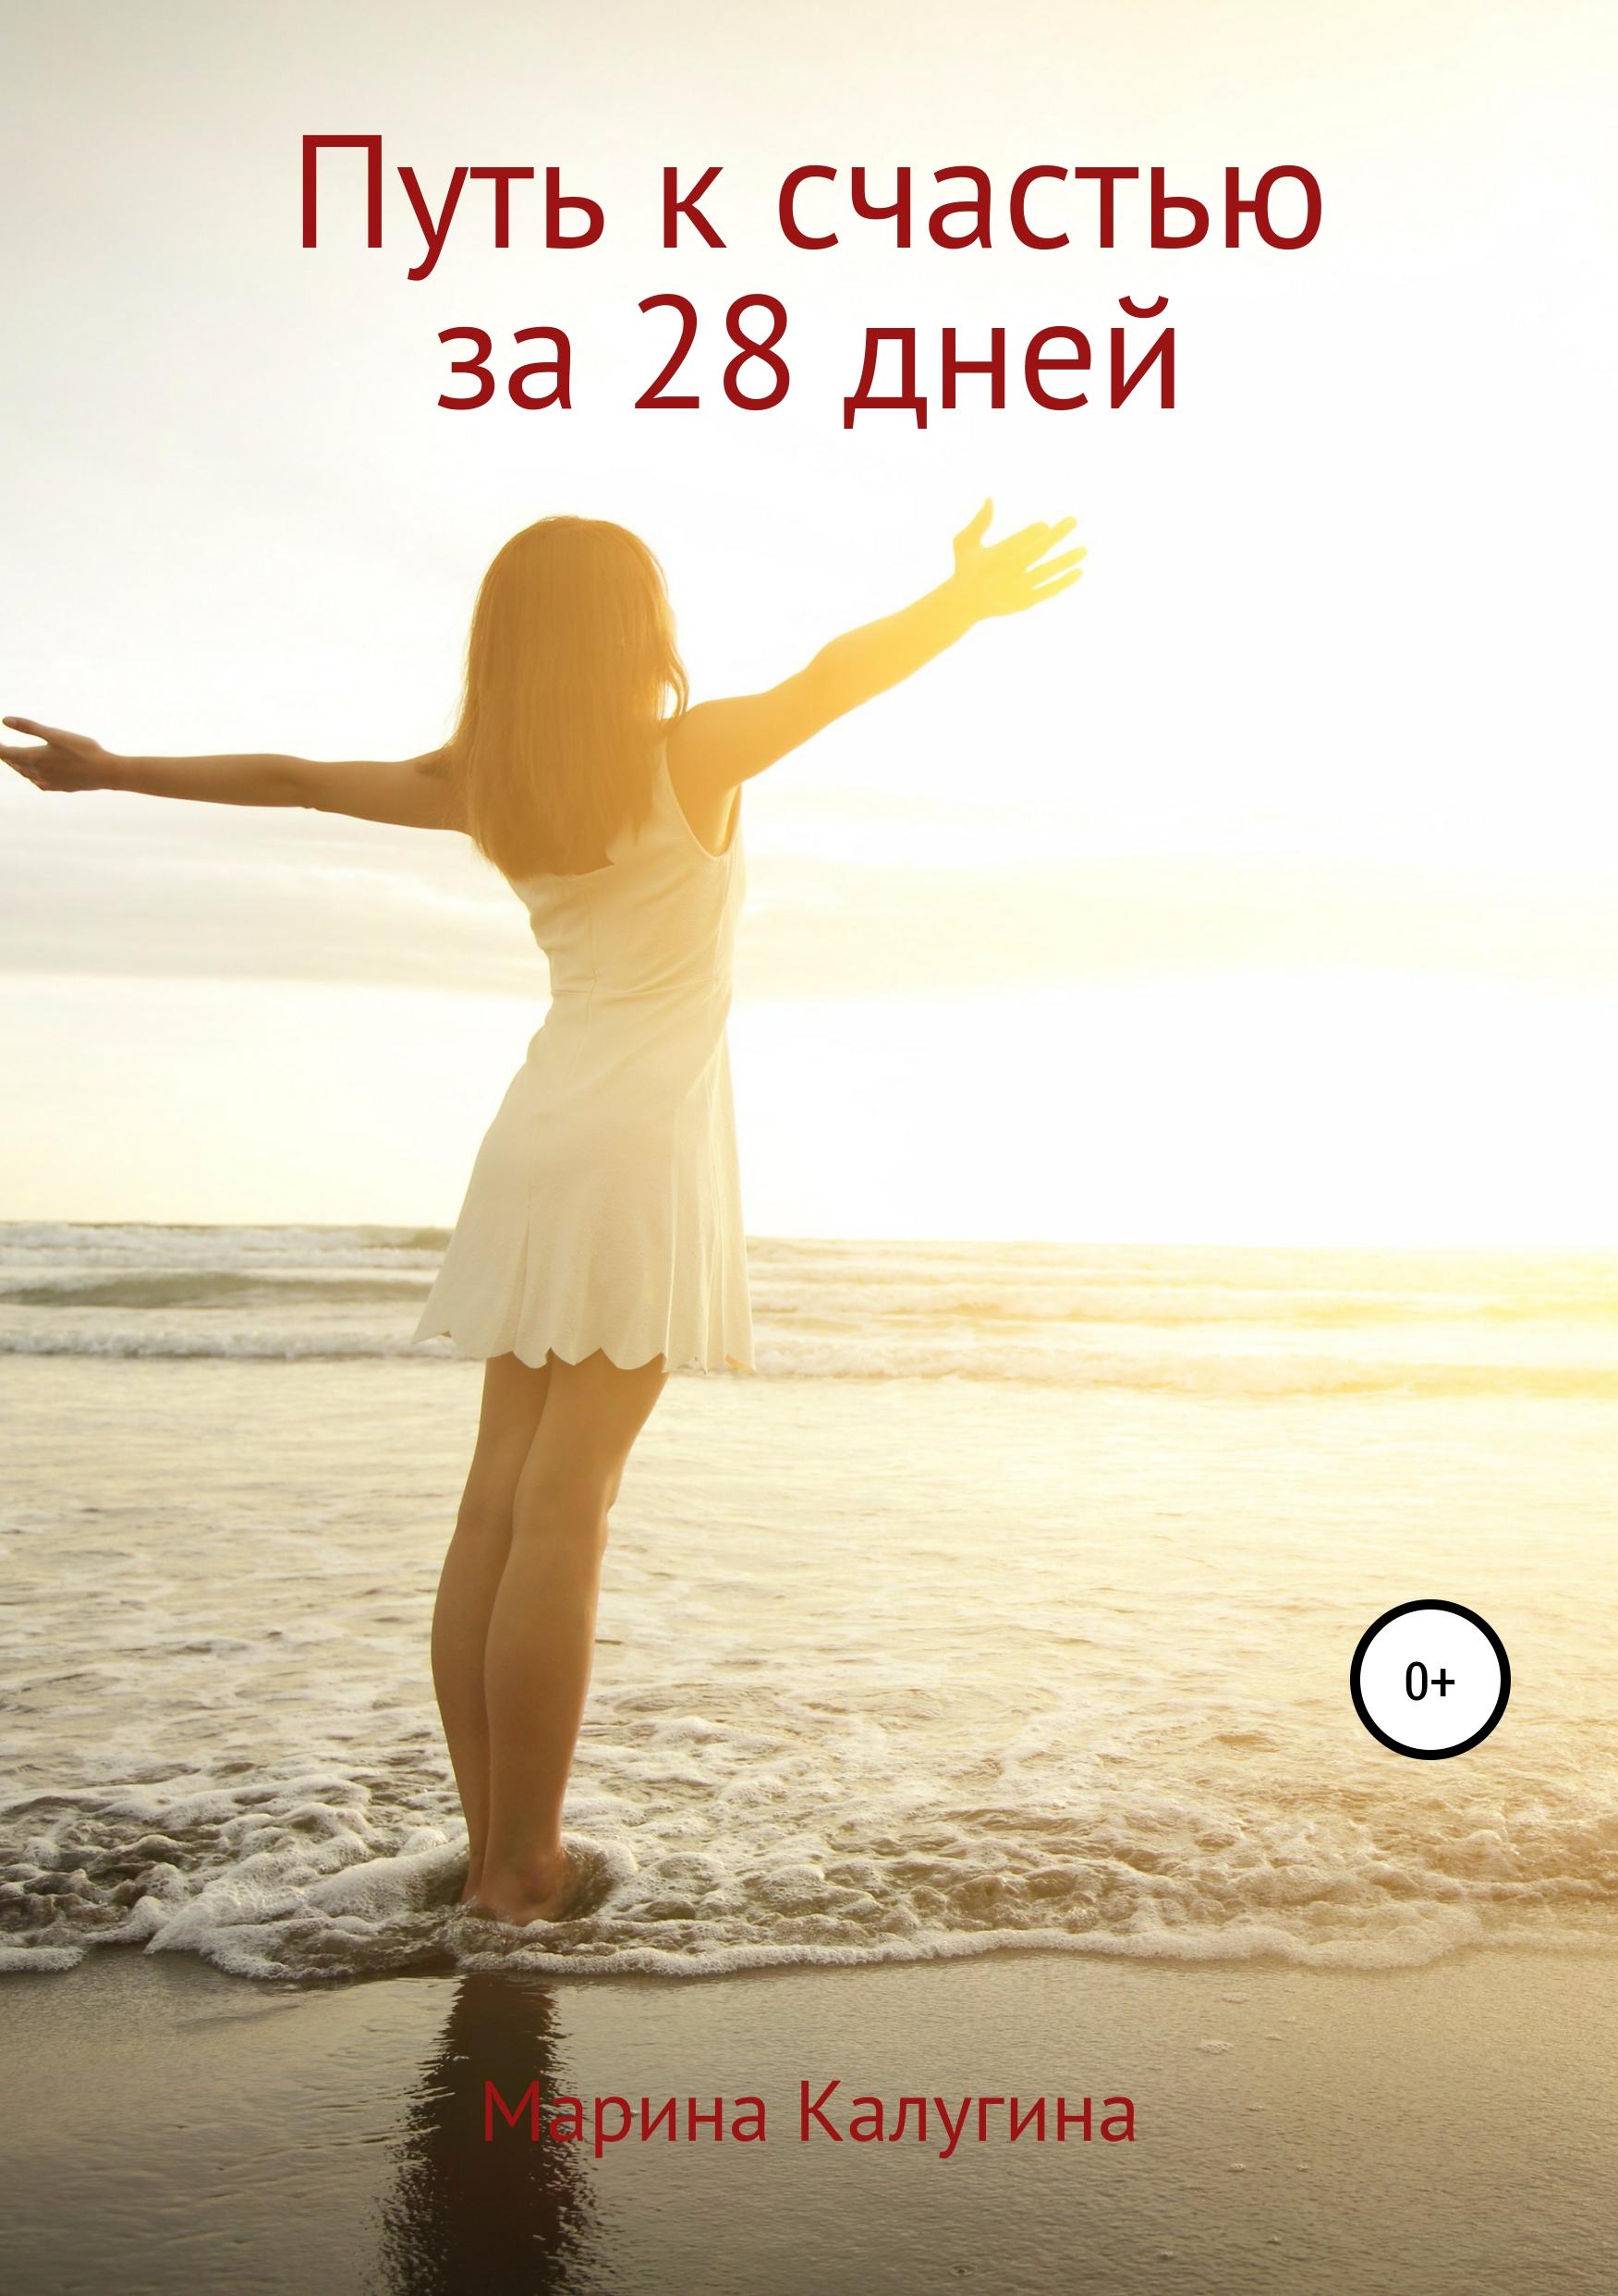 Марина Александровна Калугина Путь к счастью за 28 дней